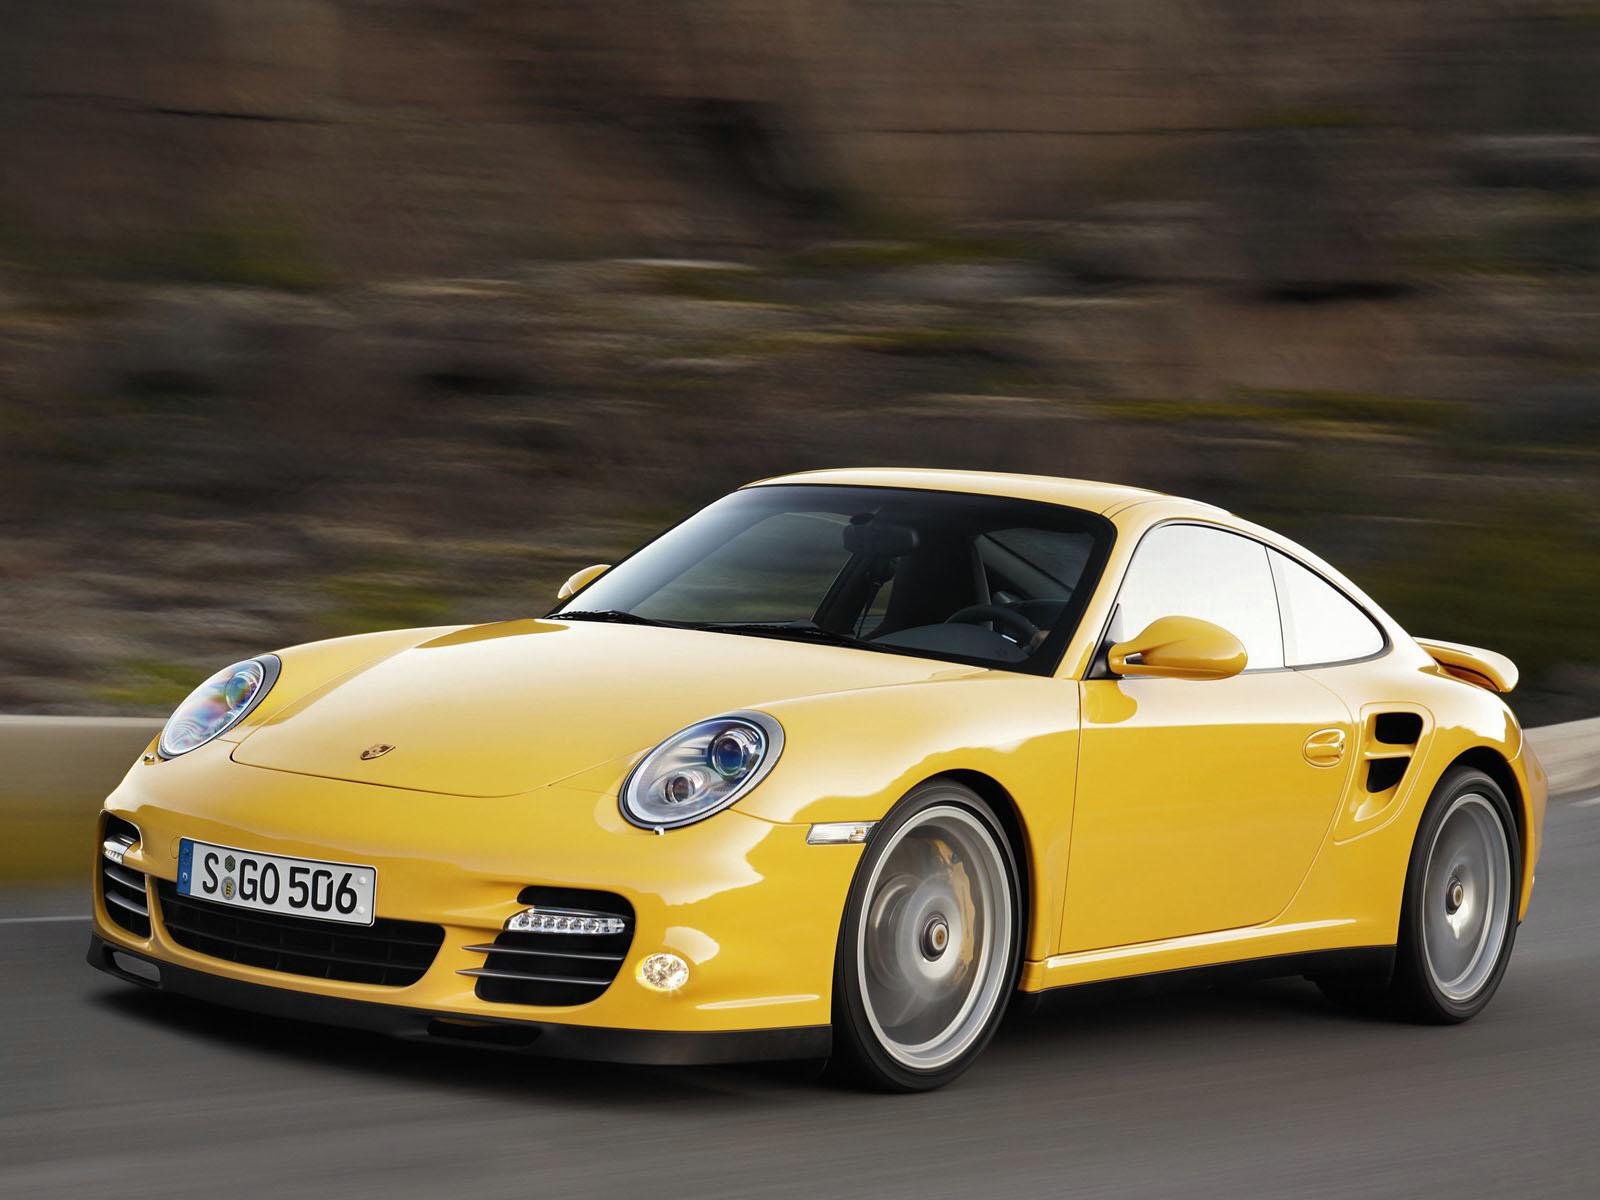 wallpapers porsche 911 turbo car desktop wallpapers porsche 911 turbo 1600x1200